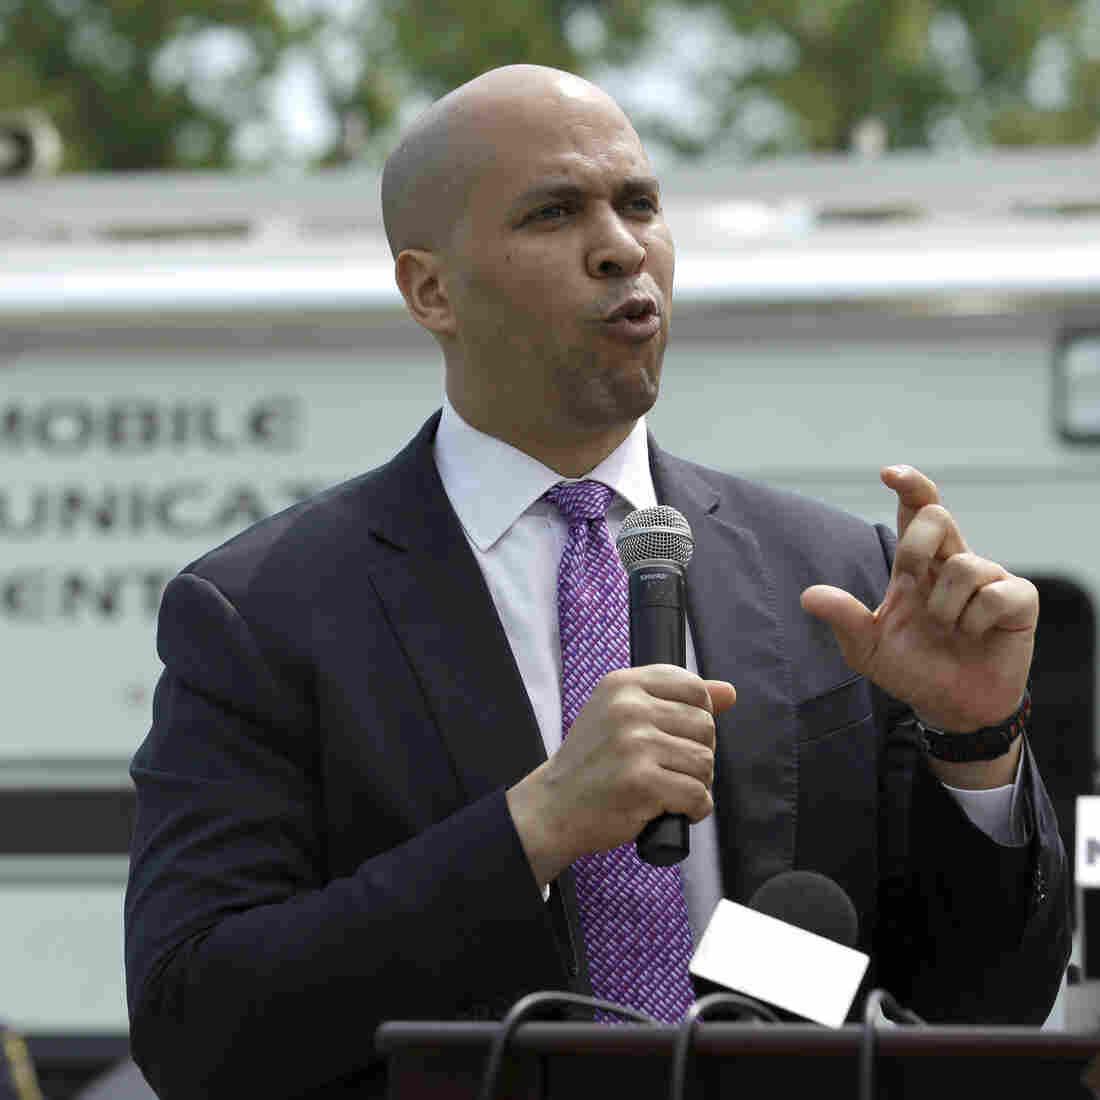 Newark Mayor To Run For New Jersey's Open U.S. Senate Seat